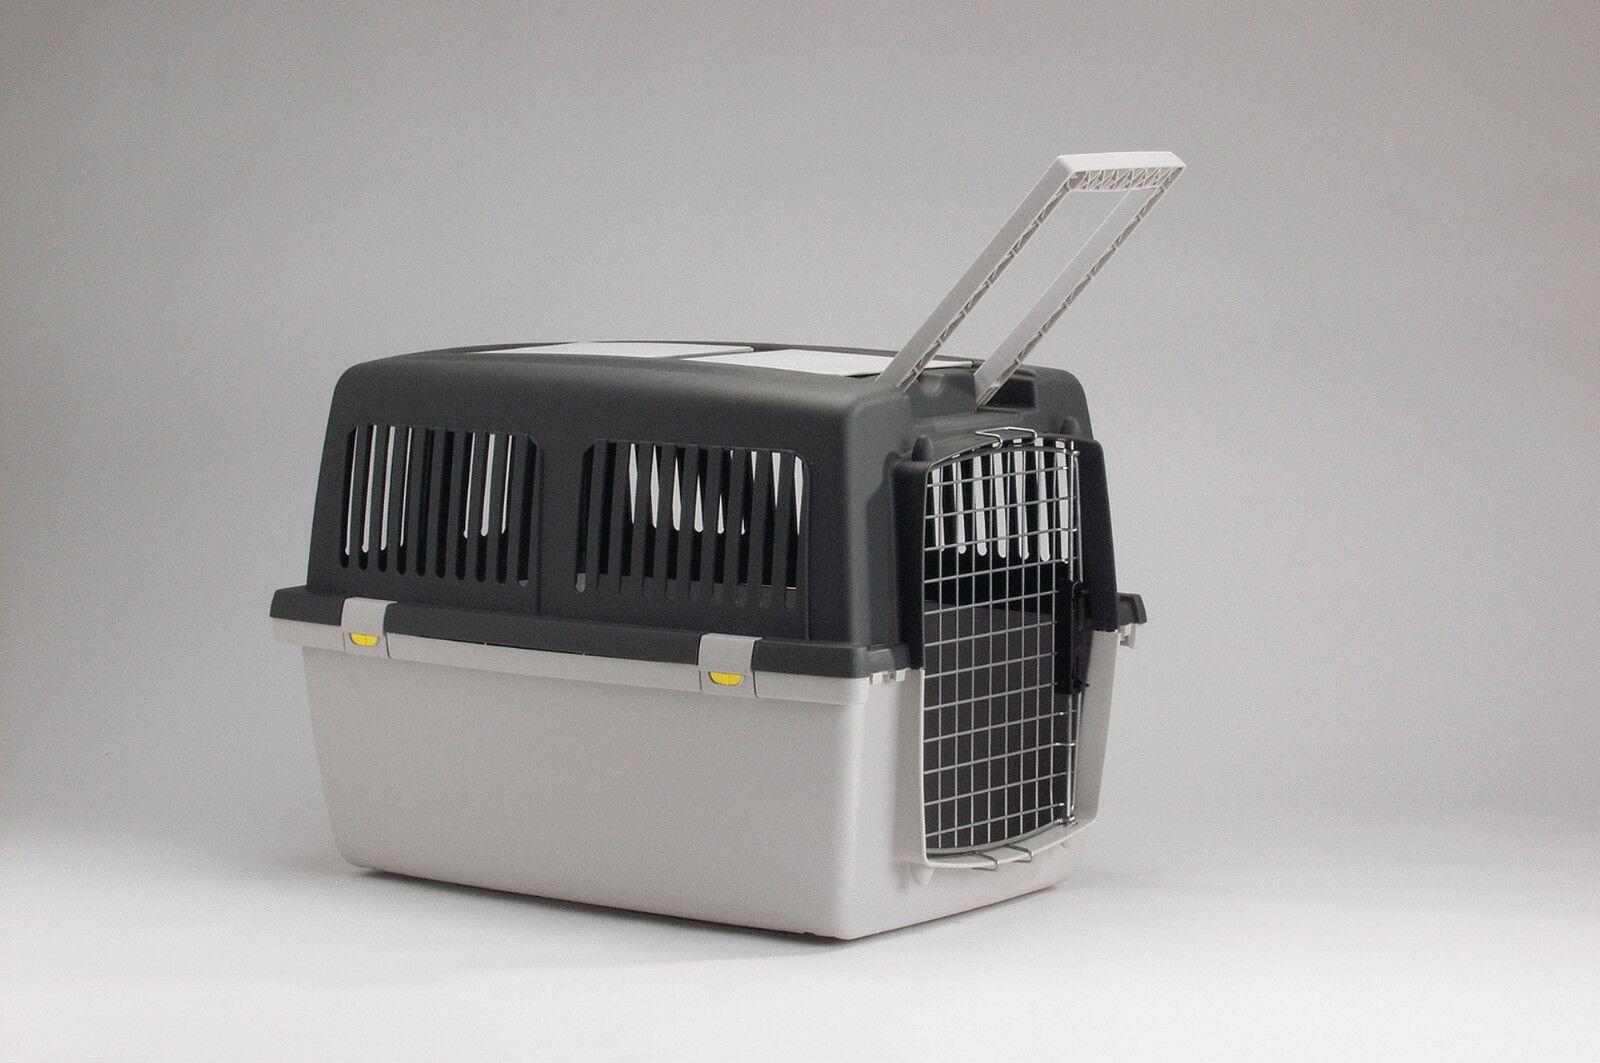 Trasportino GULLIVER 4 trasport cani trasportino per cani per Reisebox auto